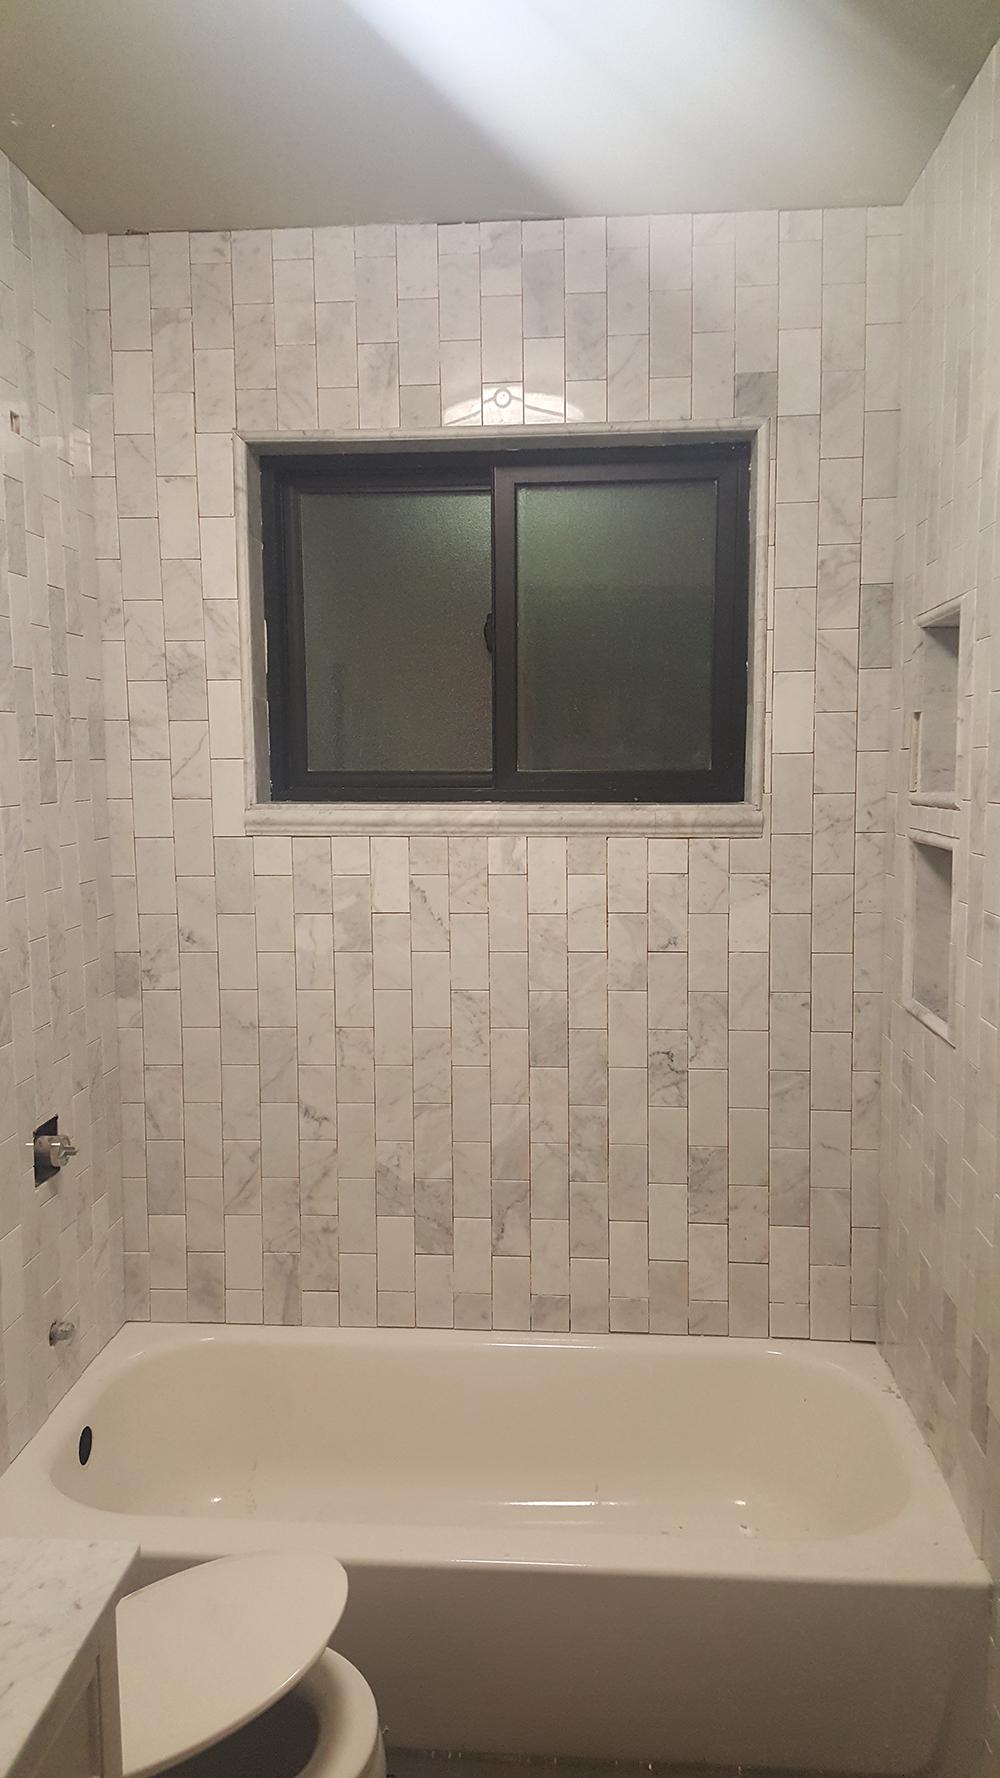 Marble Tile in Progress